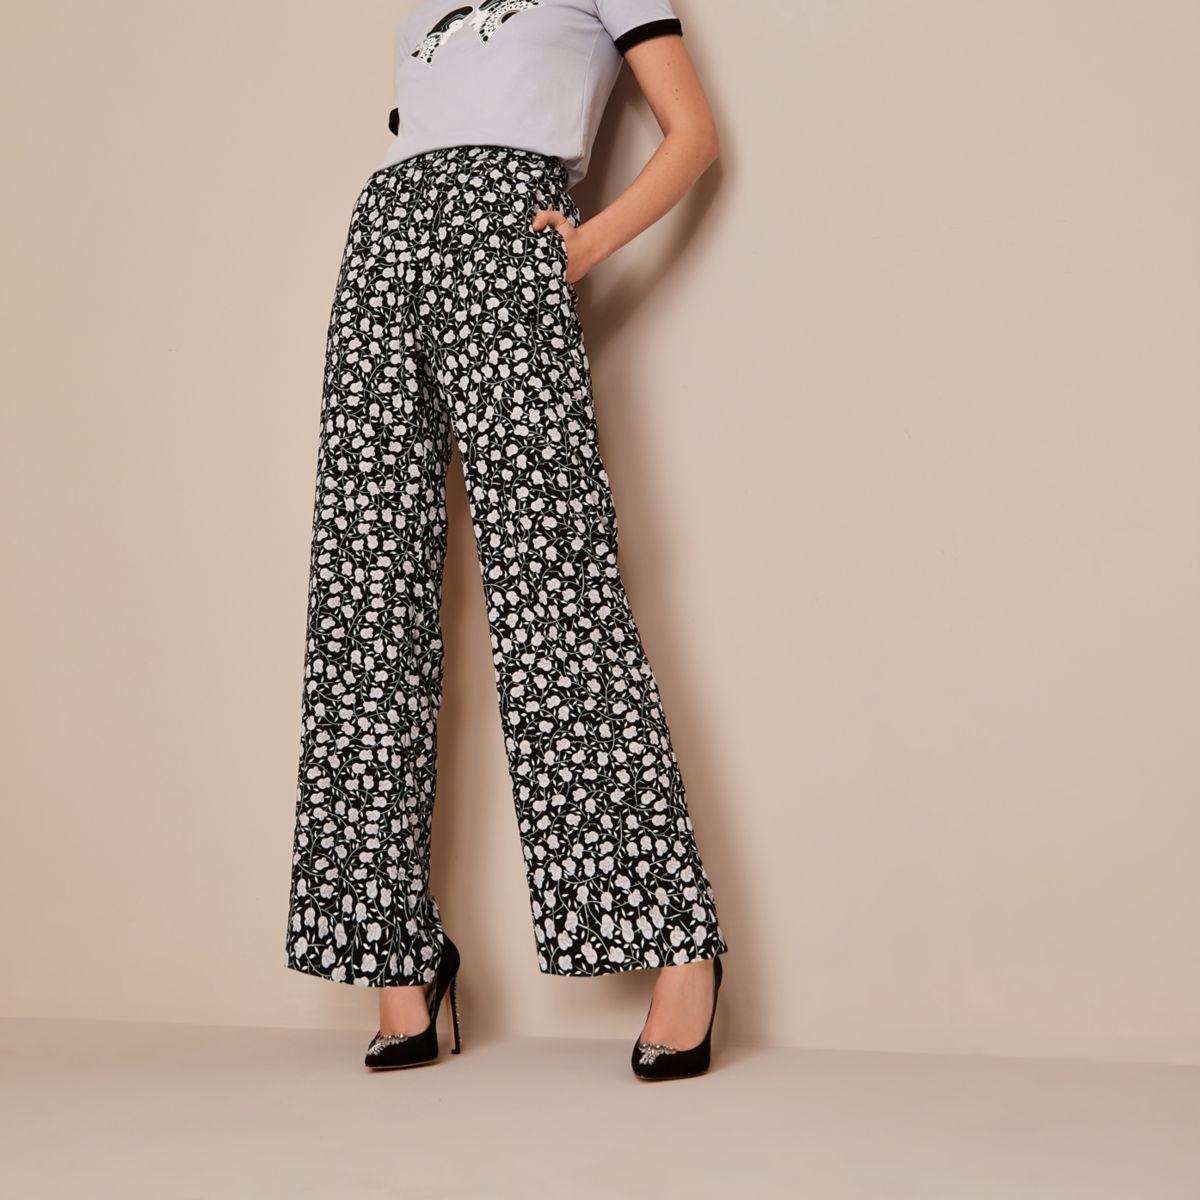 Black Holly Fulton floral wide leg pants